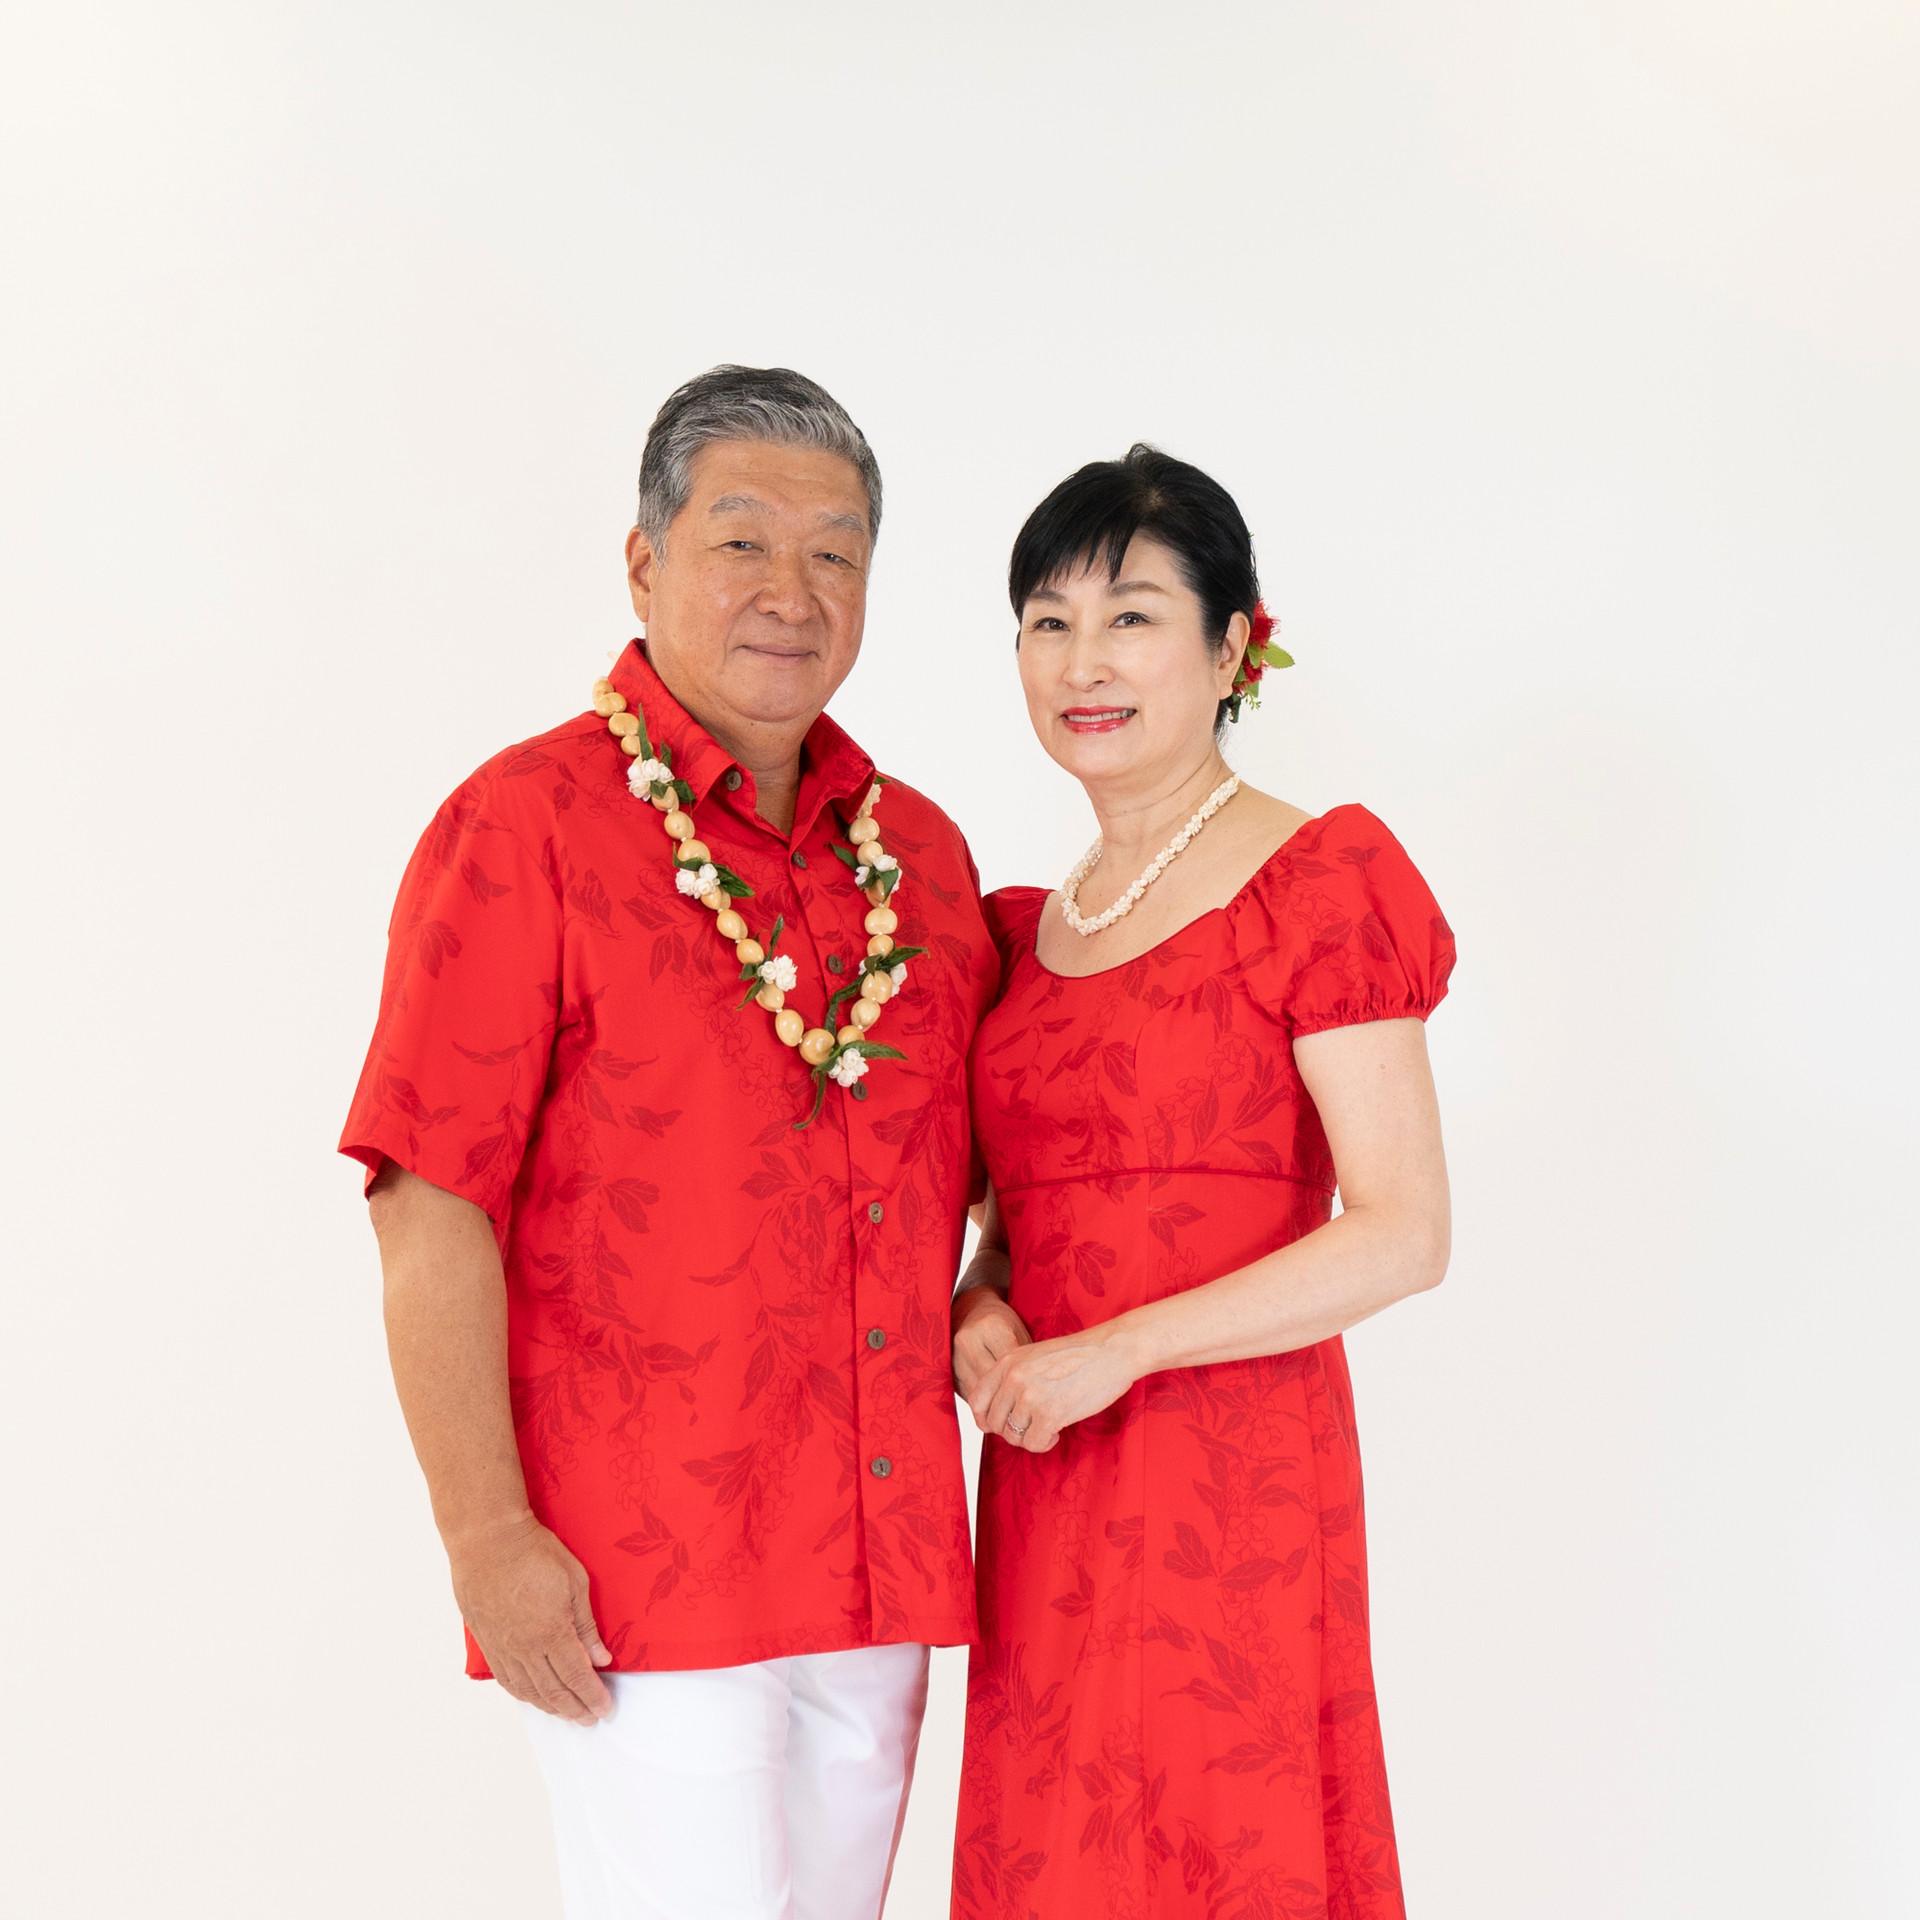 Maile print dress and shirt